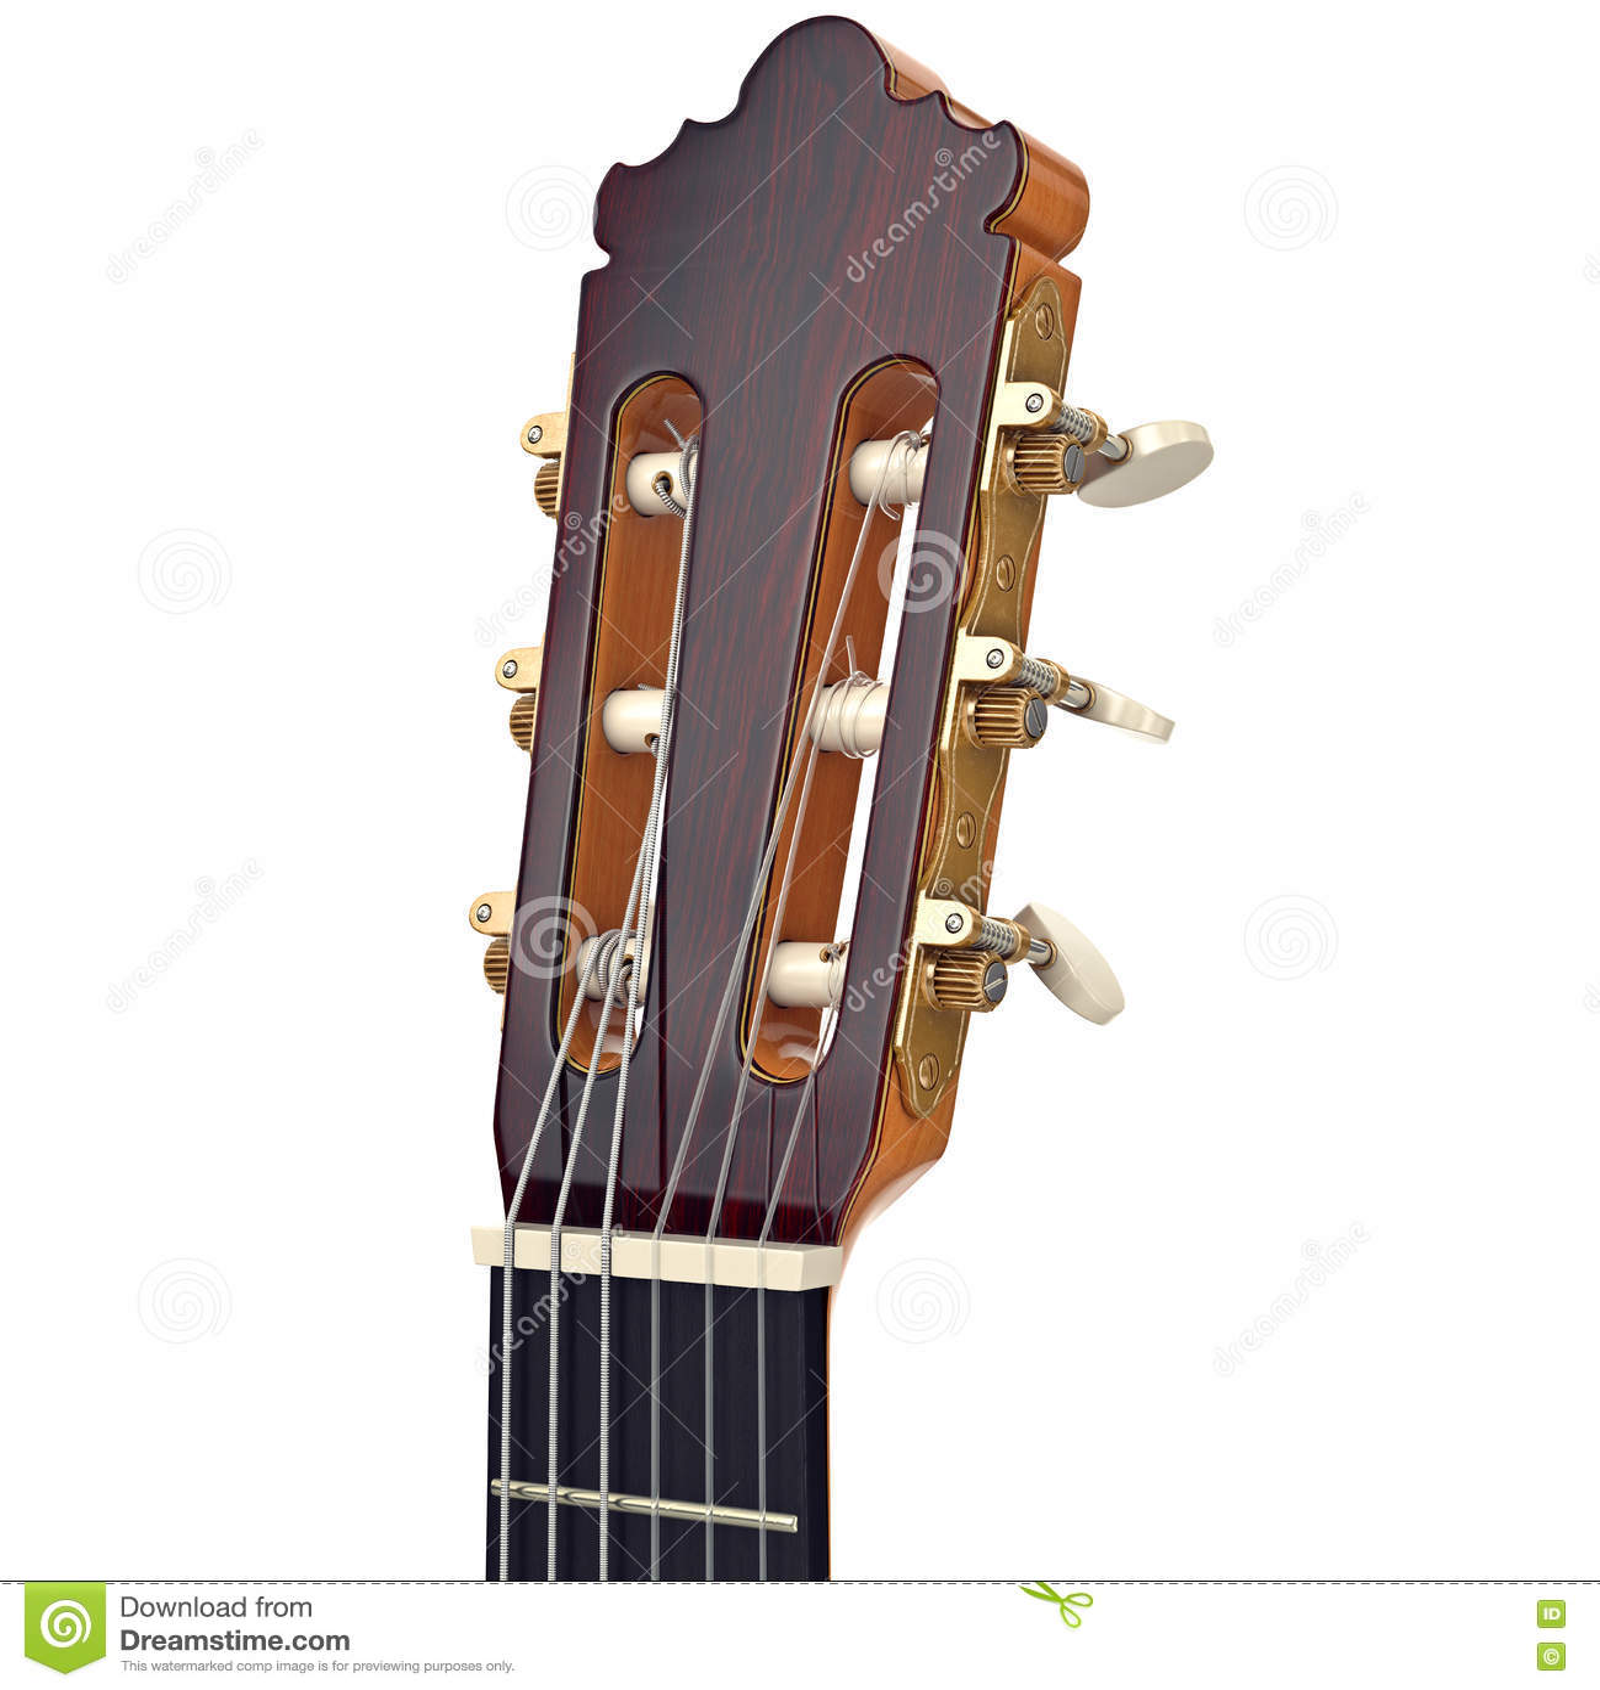 Wooden guitar headstock fingerboard, close view